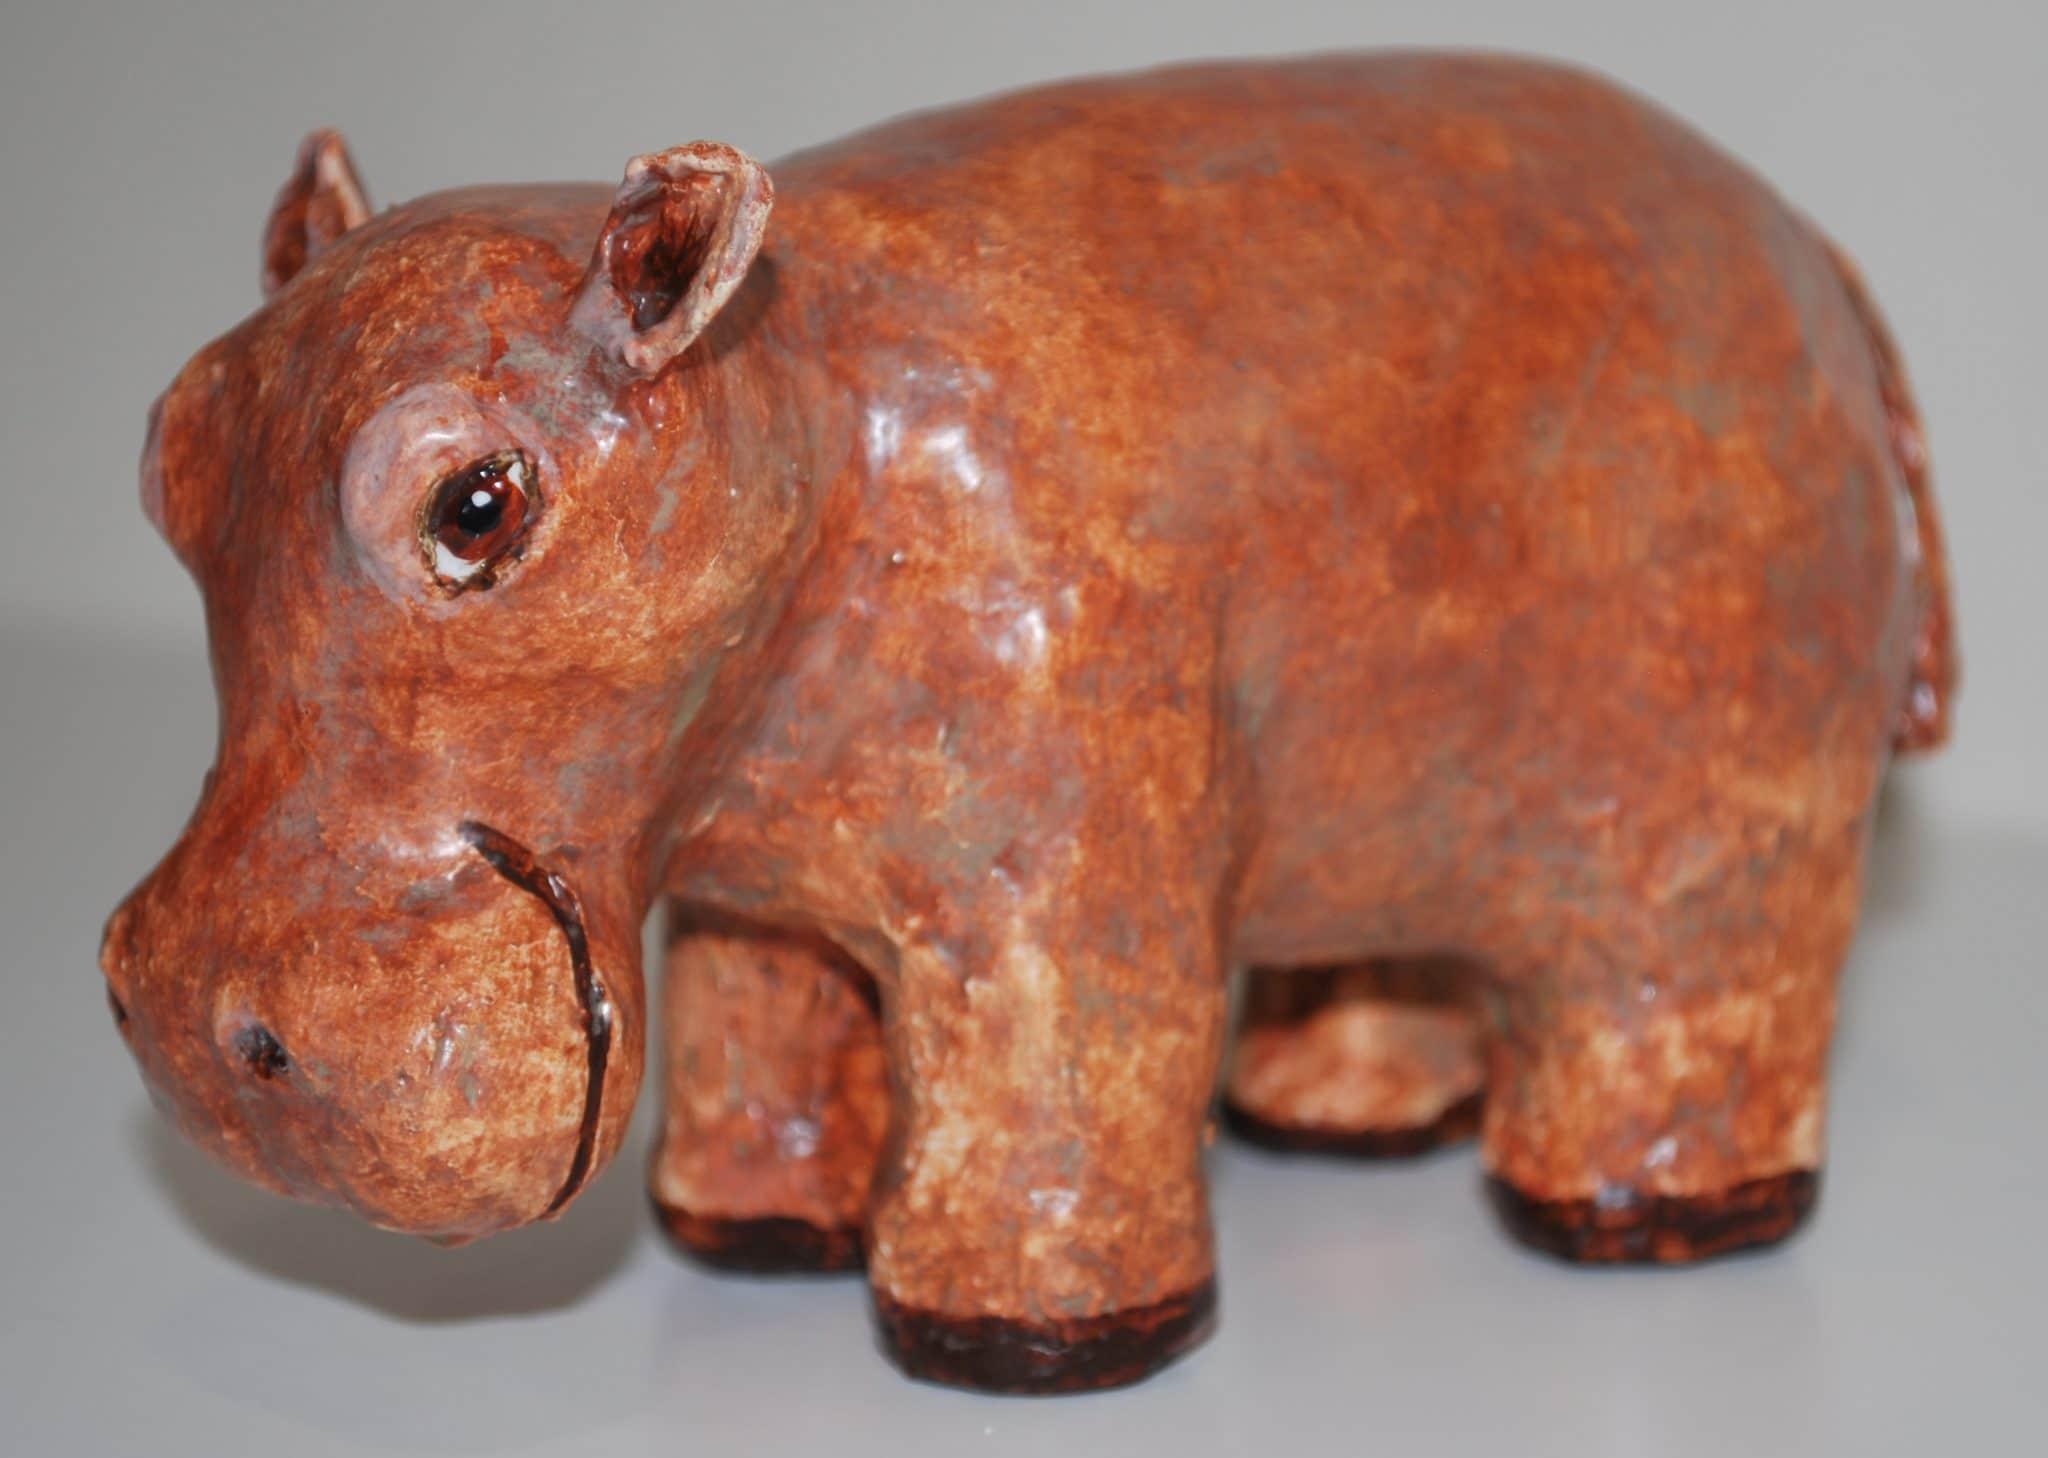 Paper mache hippo by Rex Winn